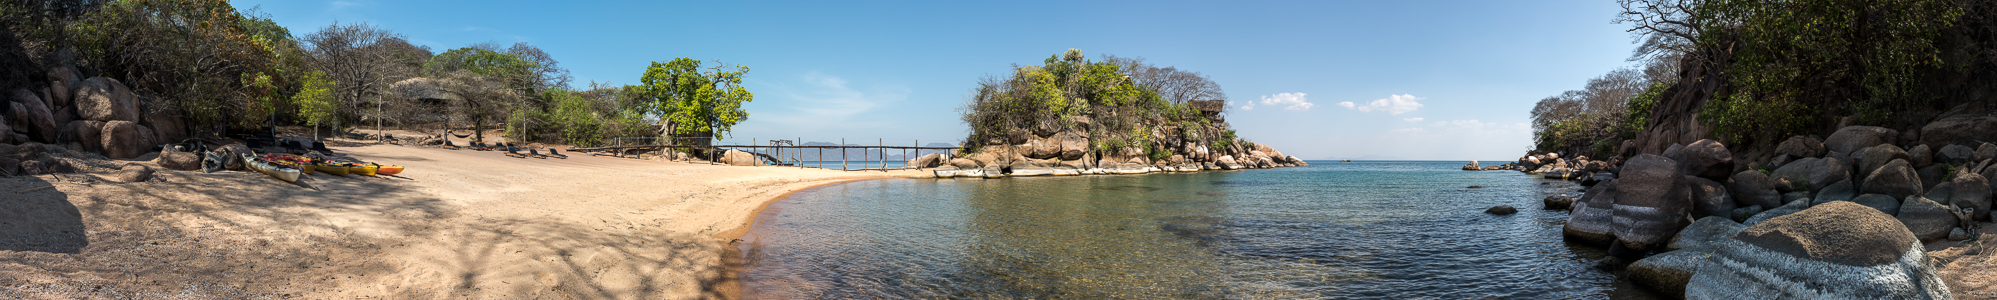 Mumbo Island Camp, Malawisee